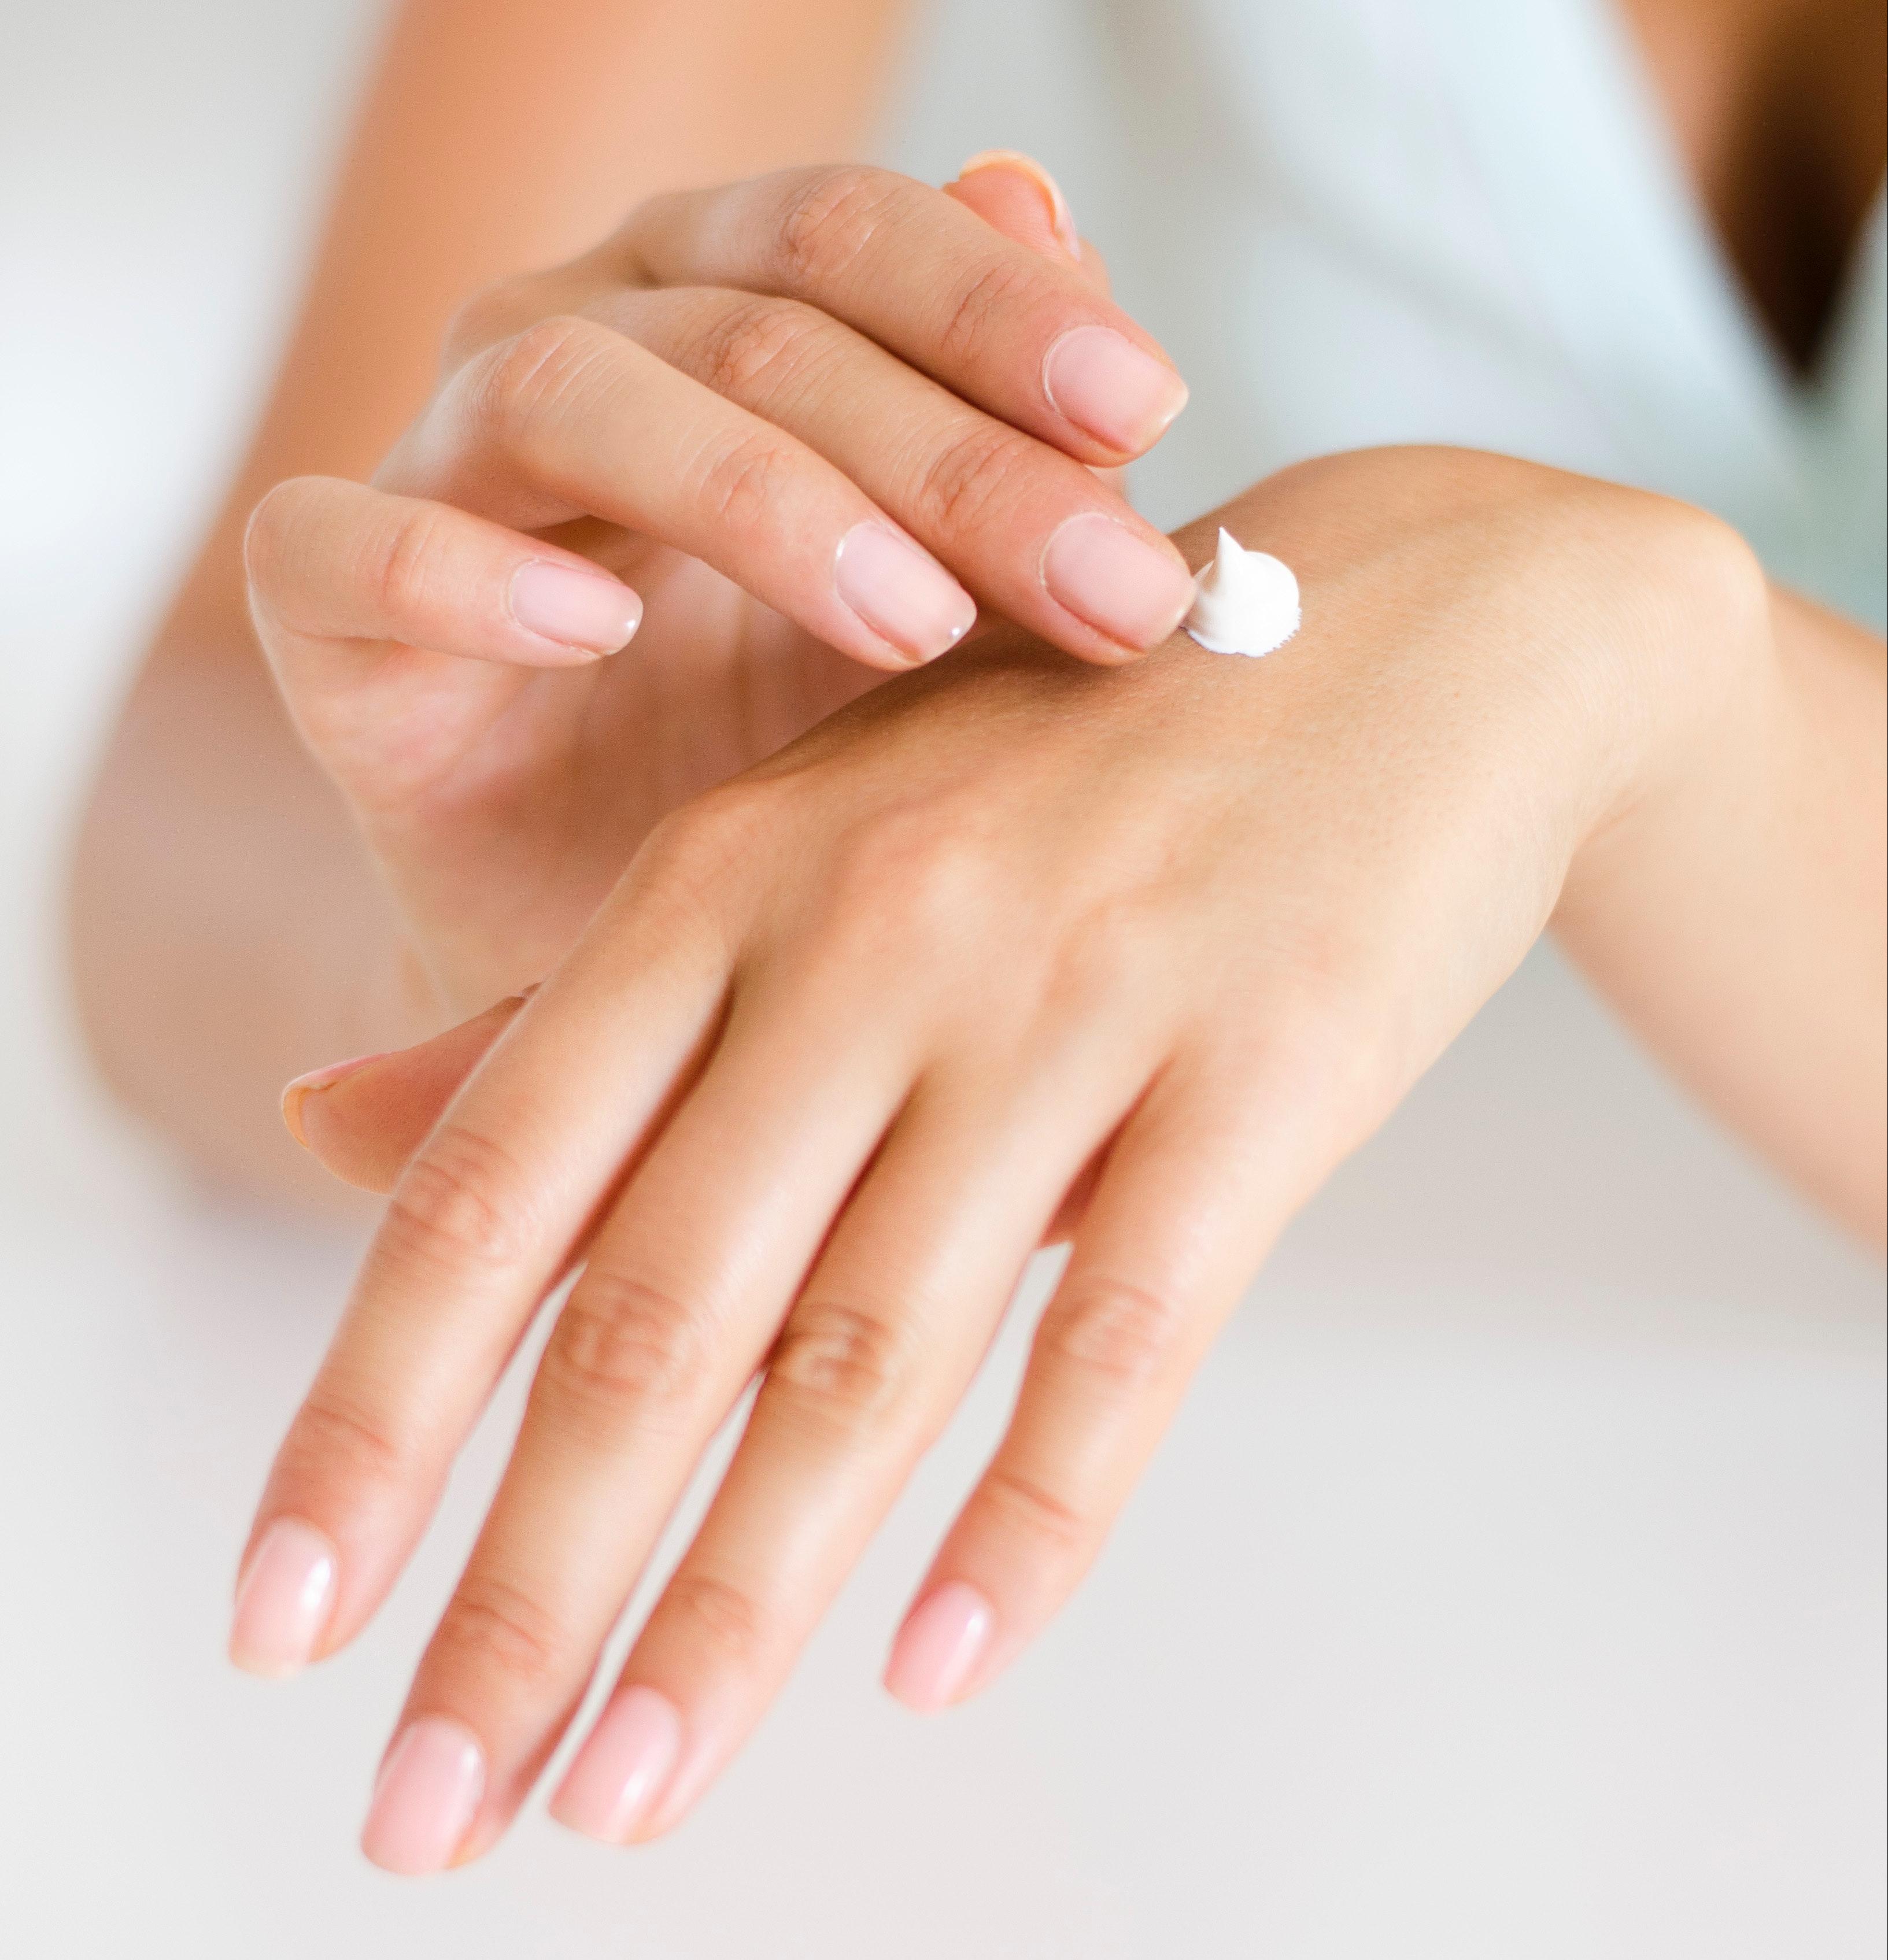 Image of hand applying hand cream